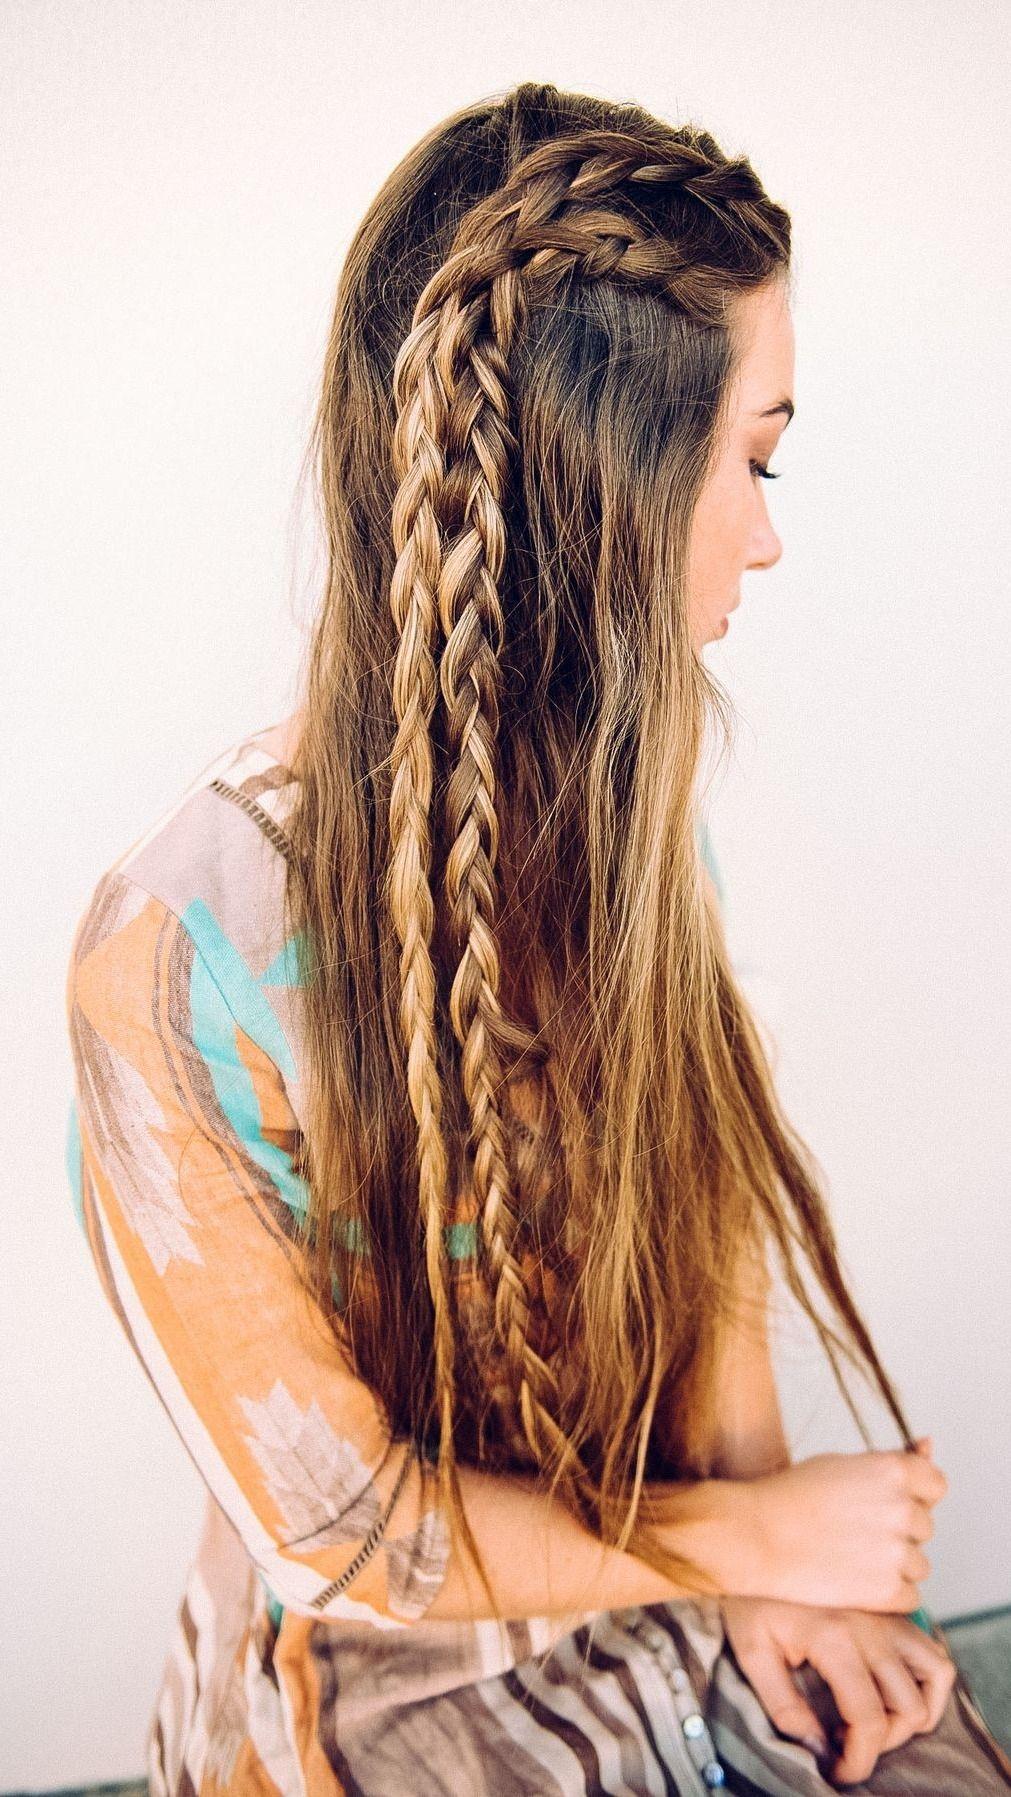 10 Non Boring Ways To Wear Braids Hair Styles Long Hair Styles Braids For Long Hair